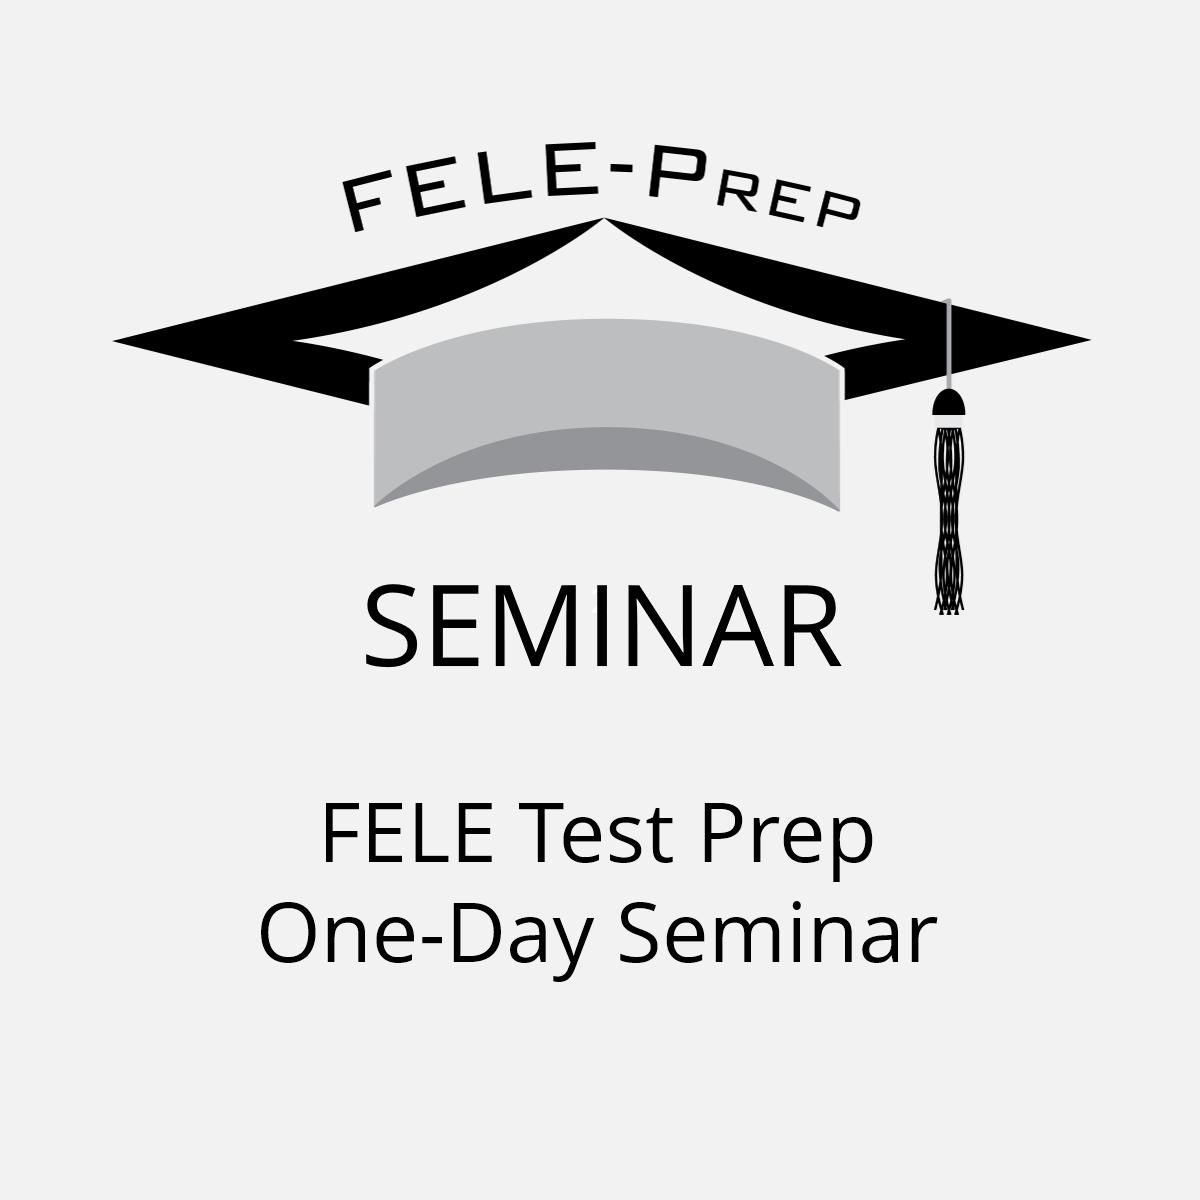 FELE Test Prep One-Day Seminar